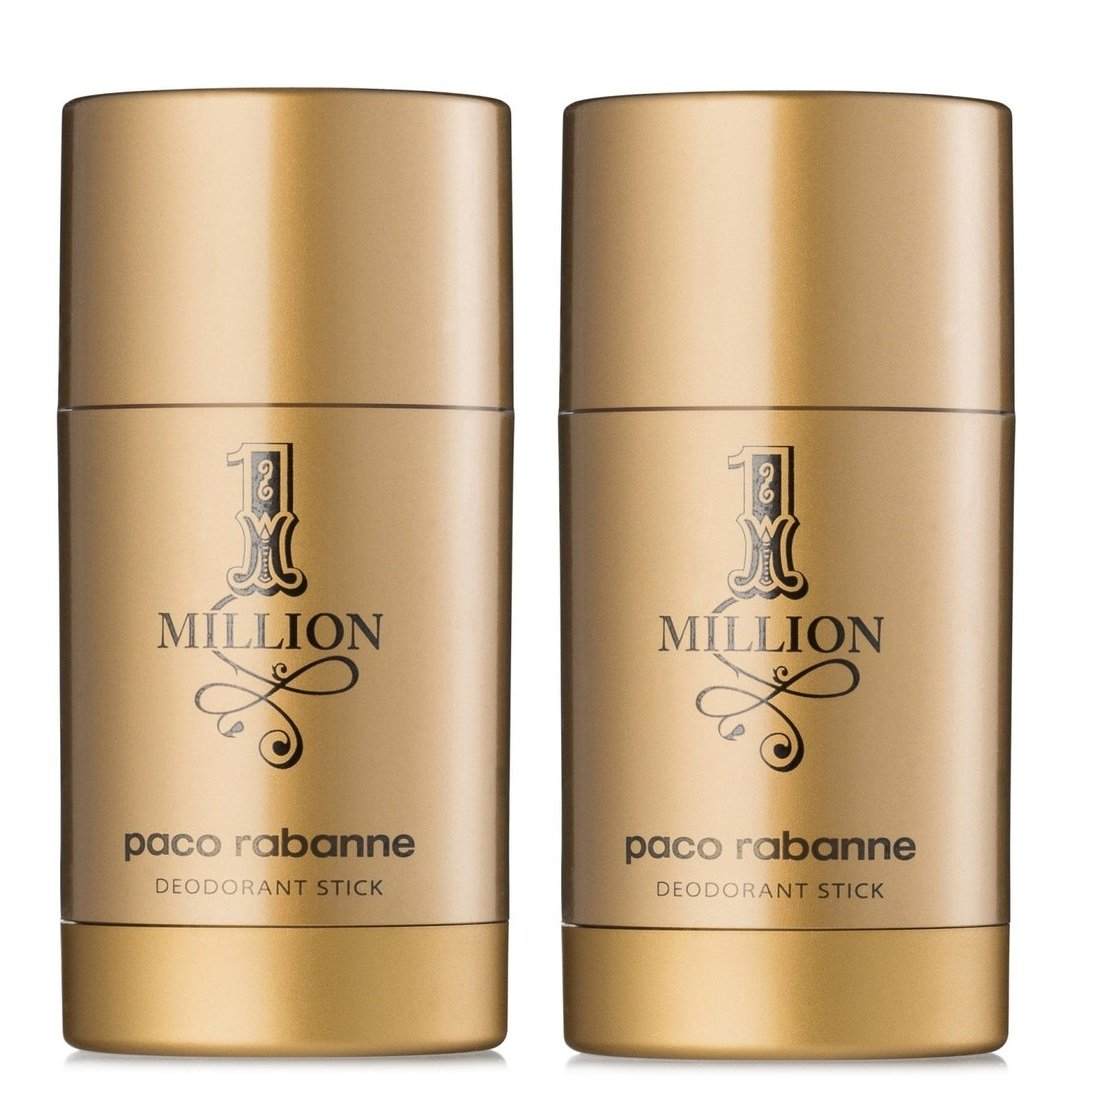 Paco Rabanne - 2x 1 Million Deodorant Stick 75 gr.